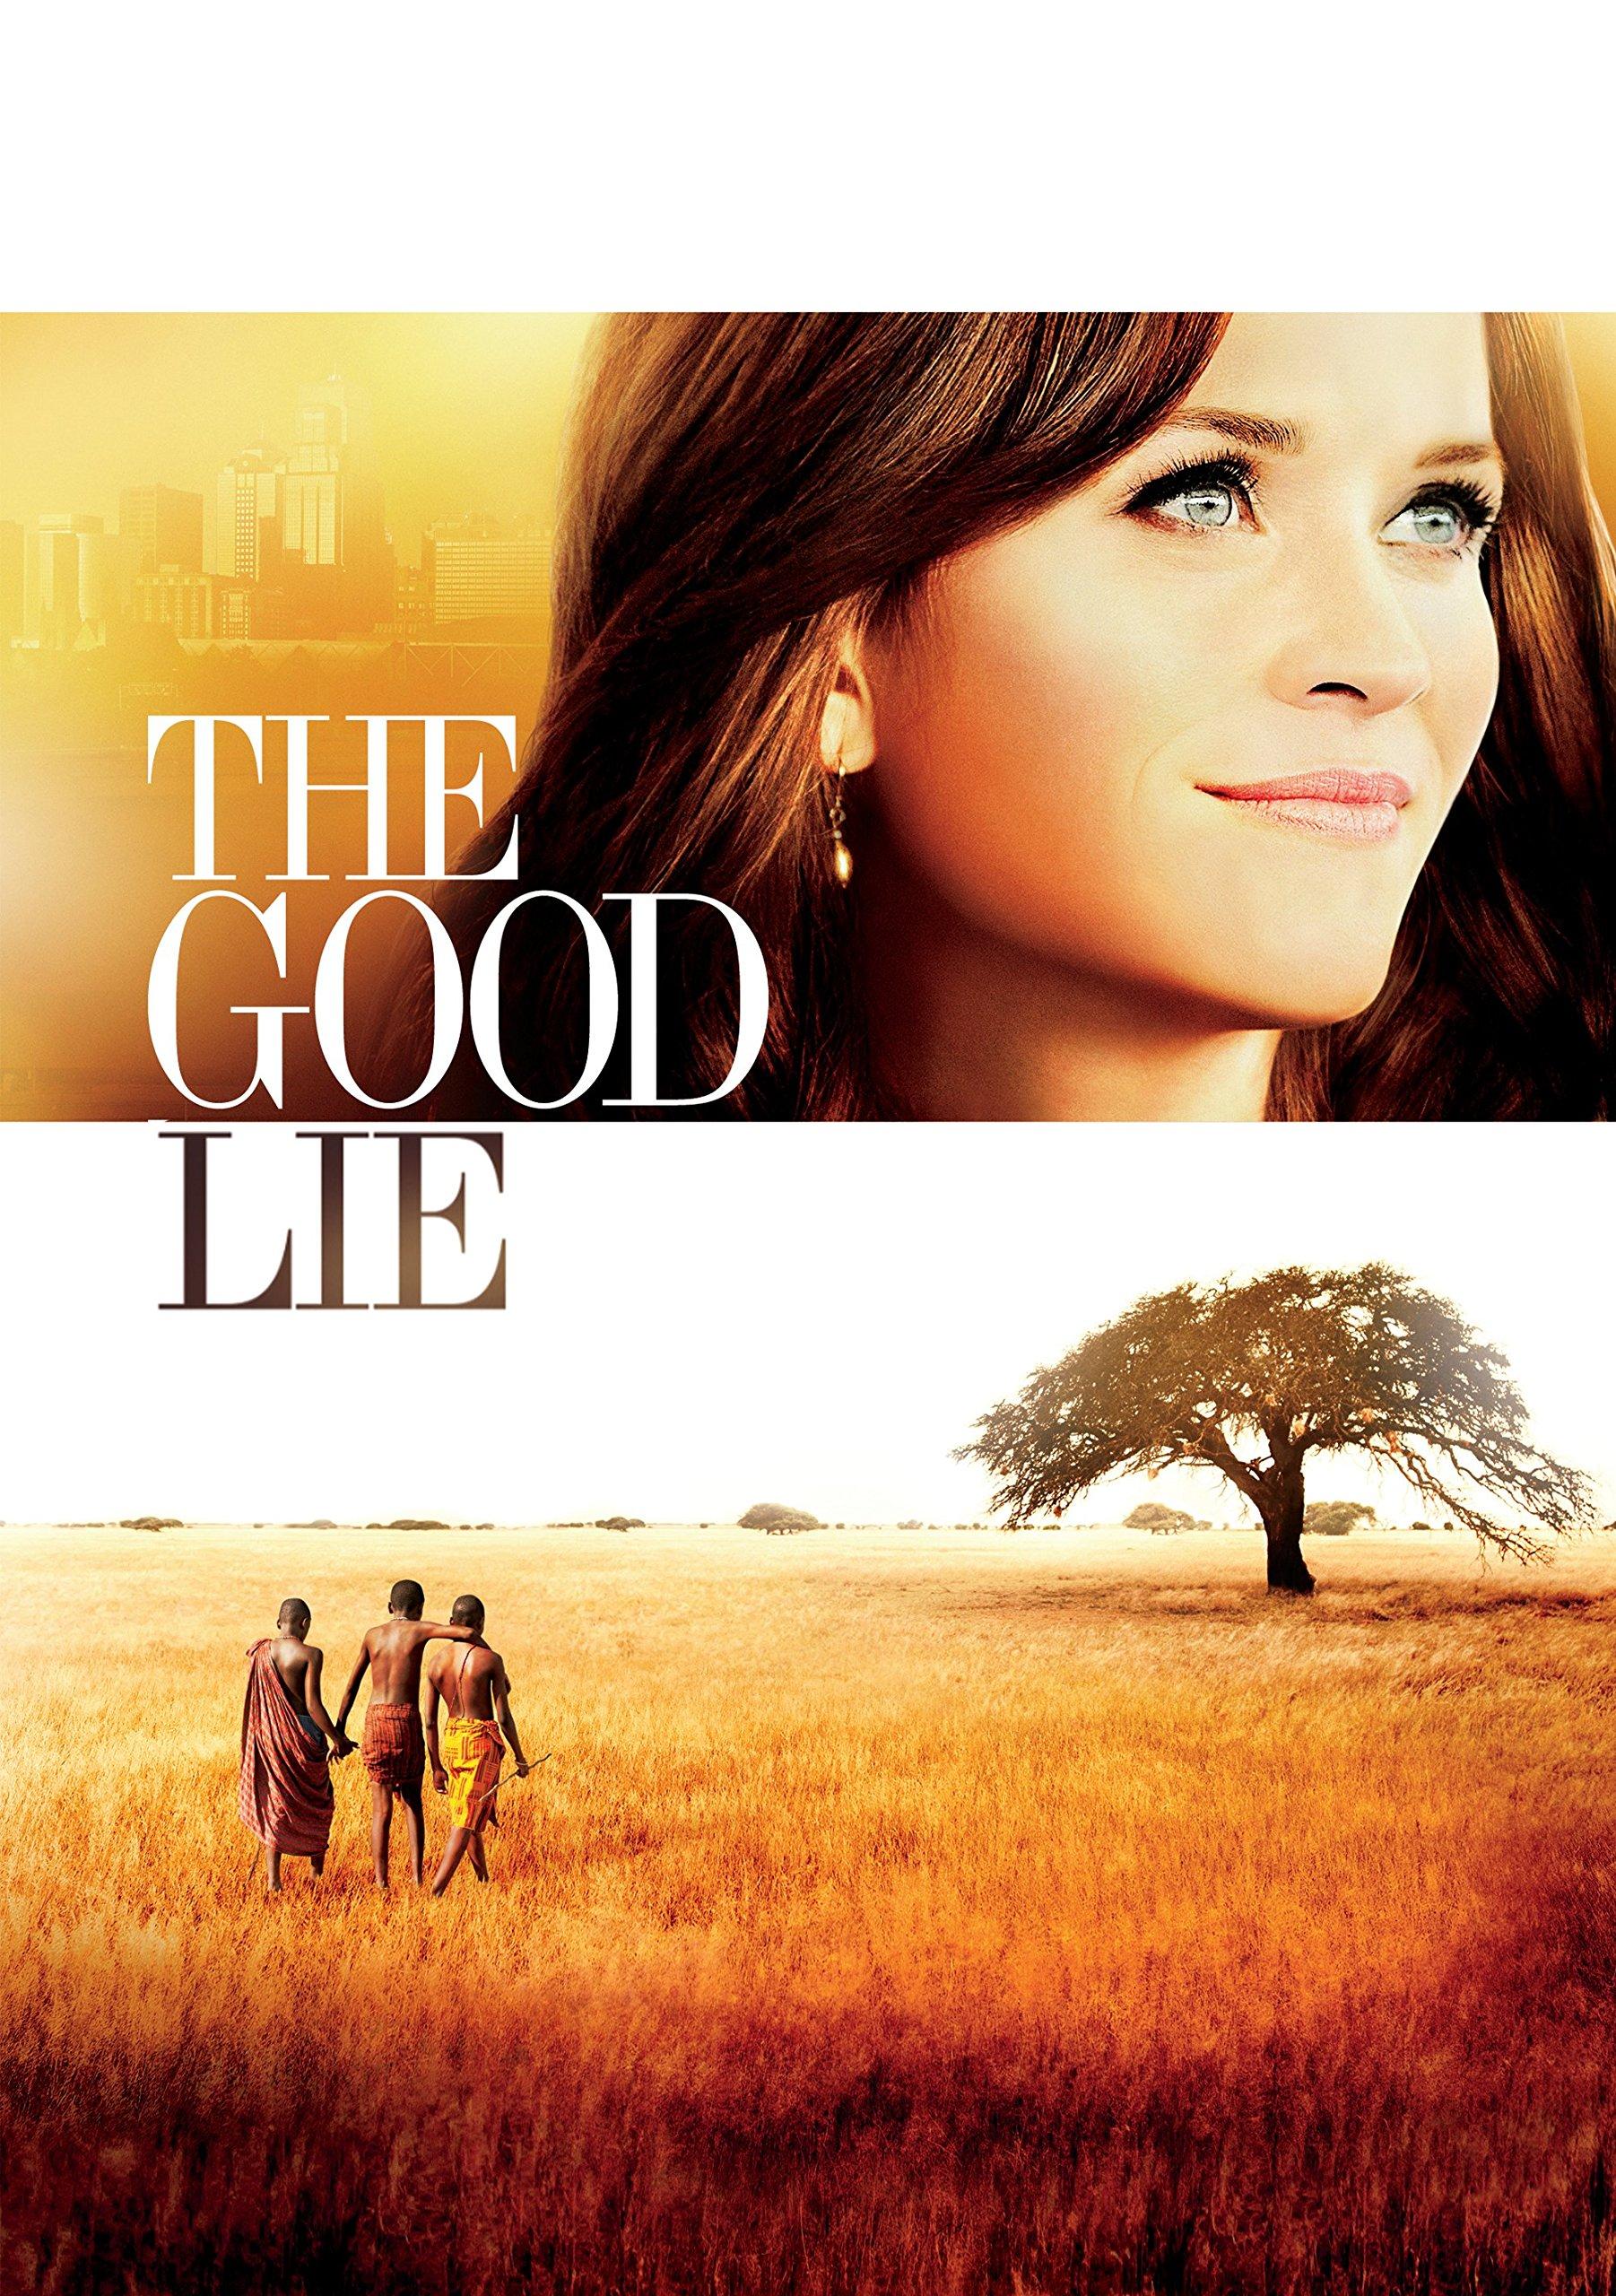 The Good Lie - DVD Image